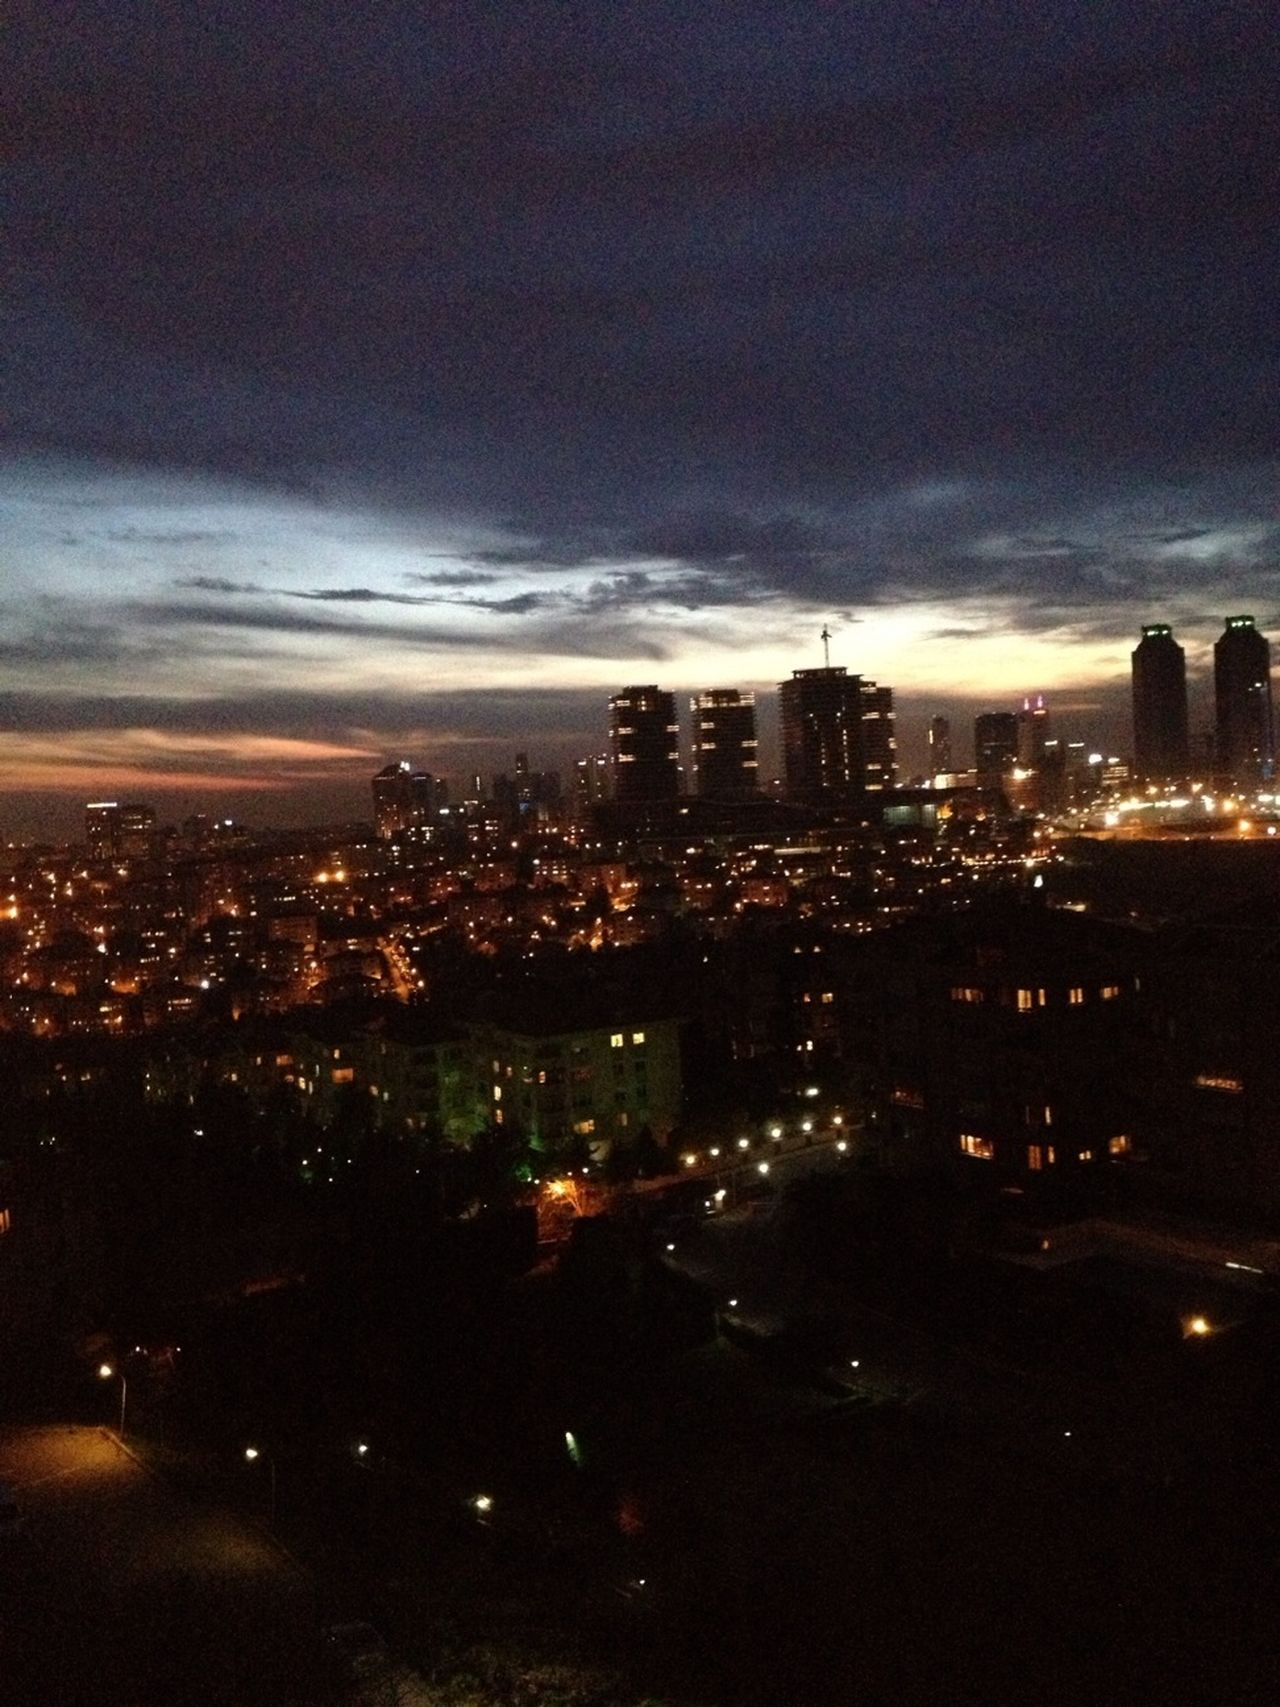 Istanbul #sunset #sun #clouds #skylovers #sky #nature #beautifulinnature #naturalbeauty #photography #landscape EyeEm Istanbul Meetup Divearchitecture